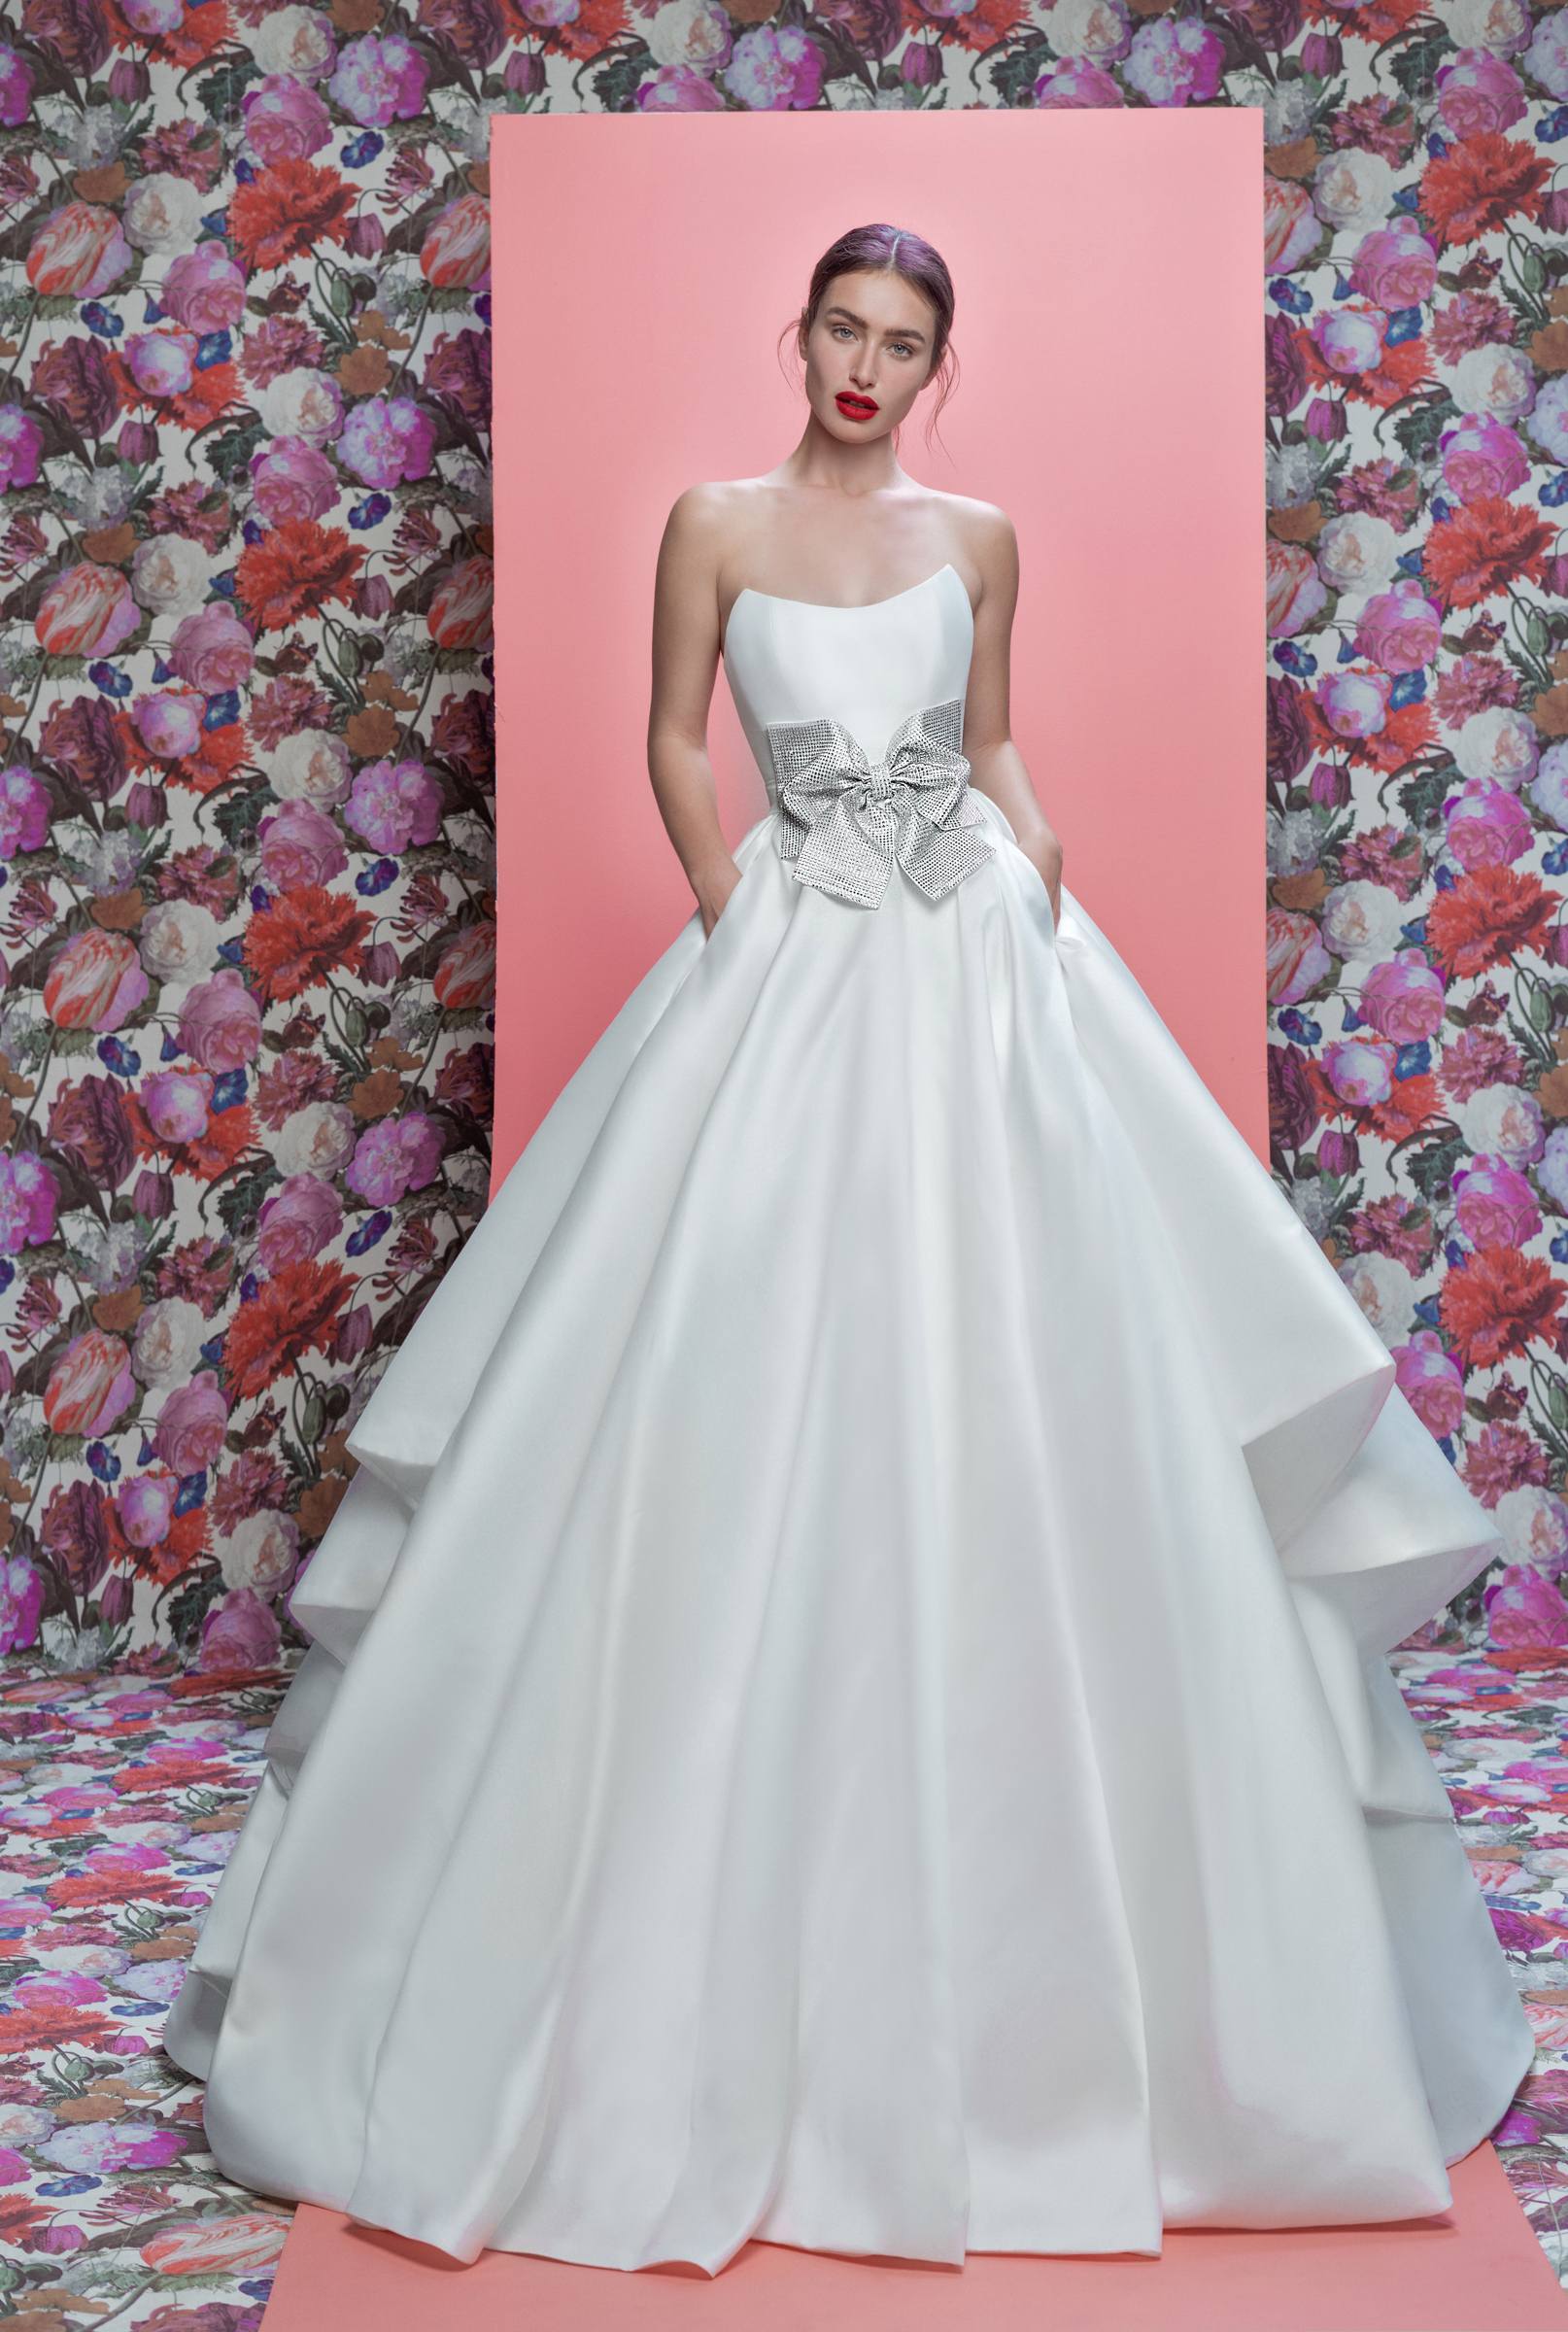 Galia Lahav wedding dress spring 2019 strapless satin ball gown